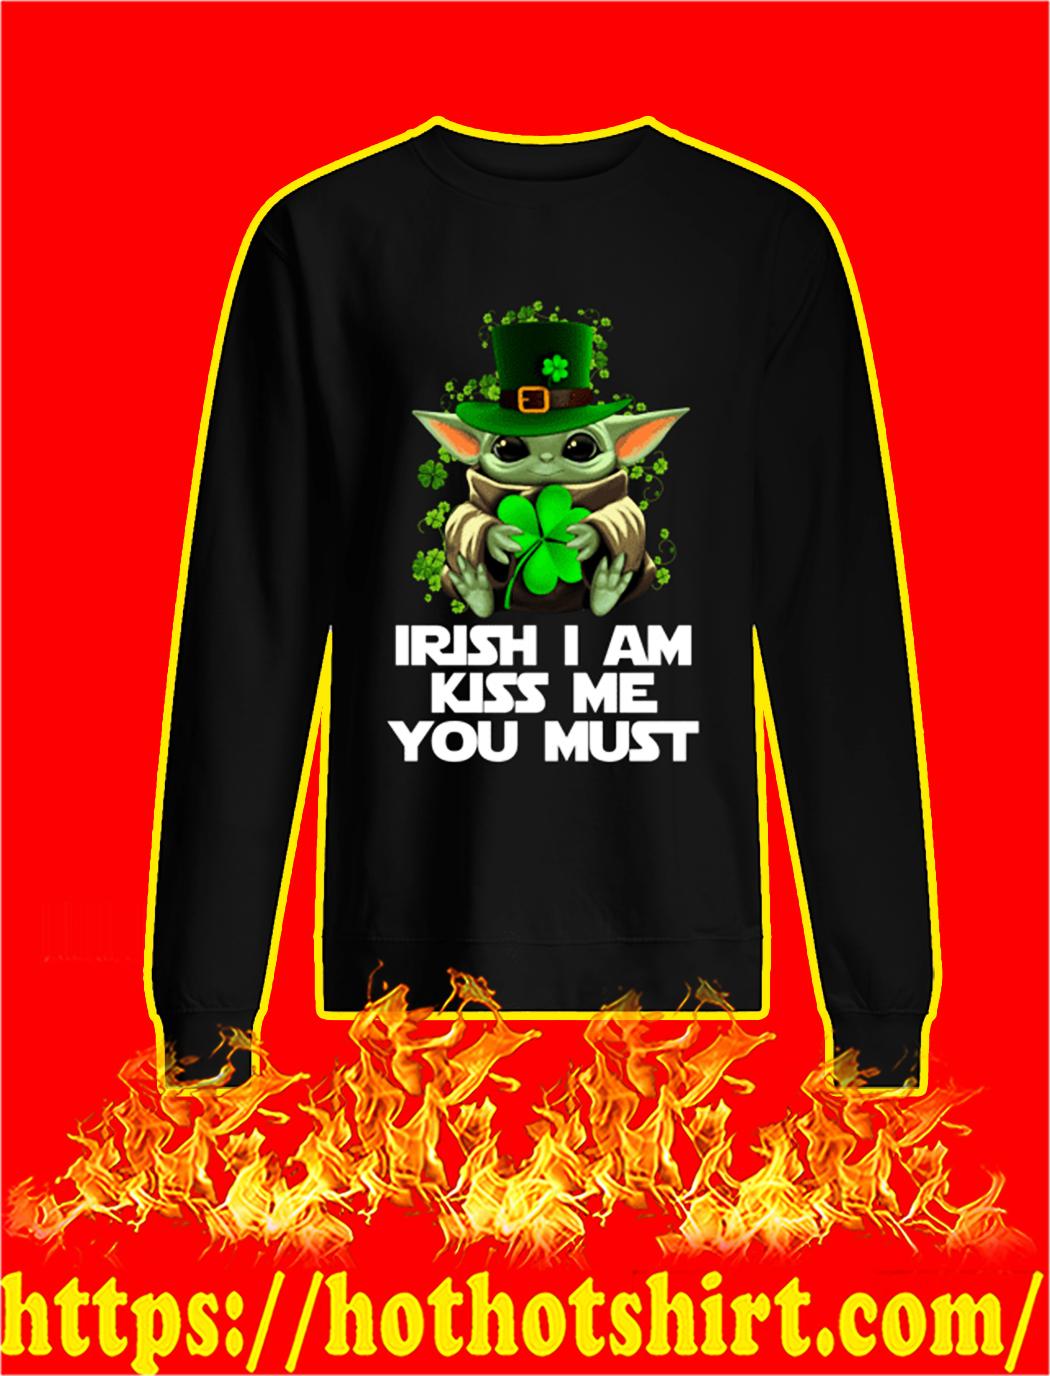 Yoda Irish I Am Kiss Me You Must sweatsYoda Irish I Am Kiss Me You Must sweatshirthirt